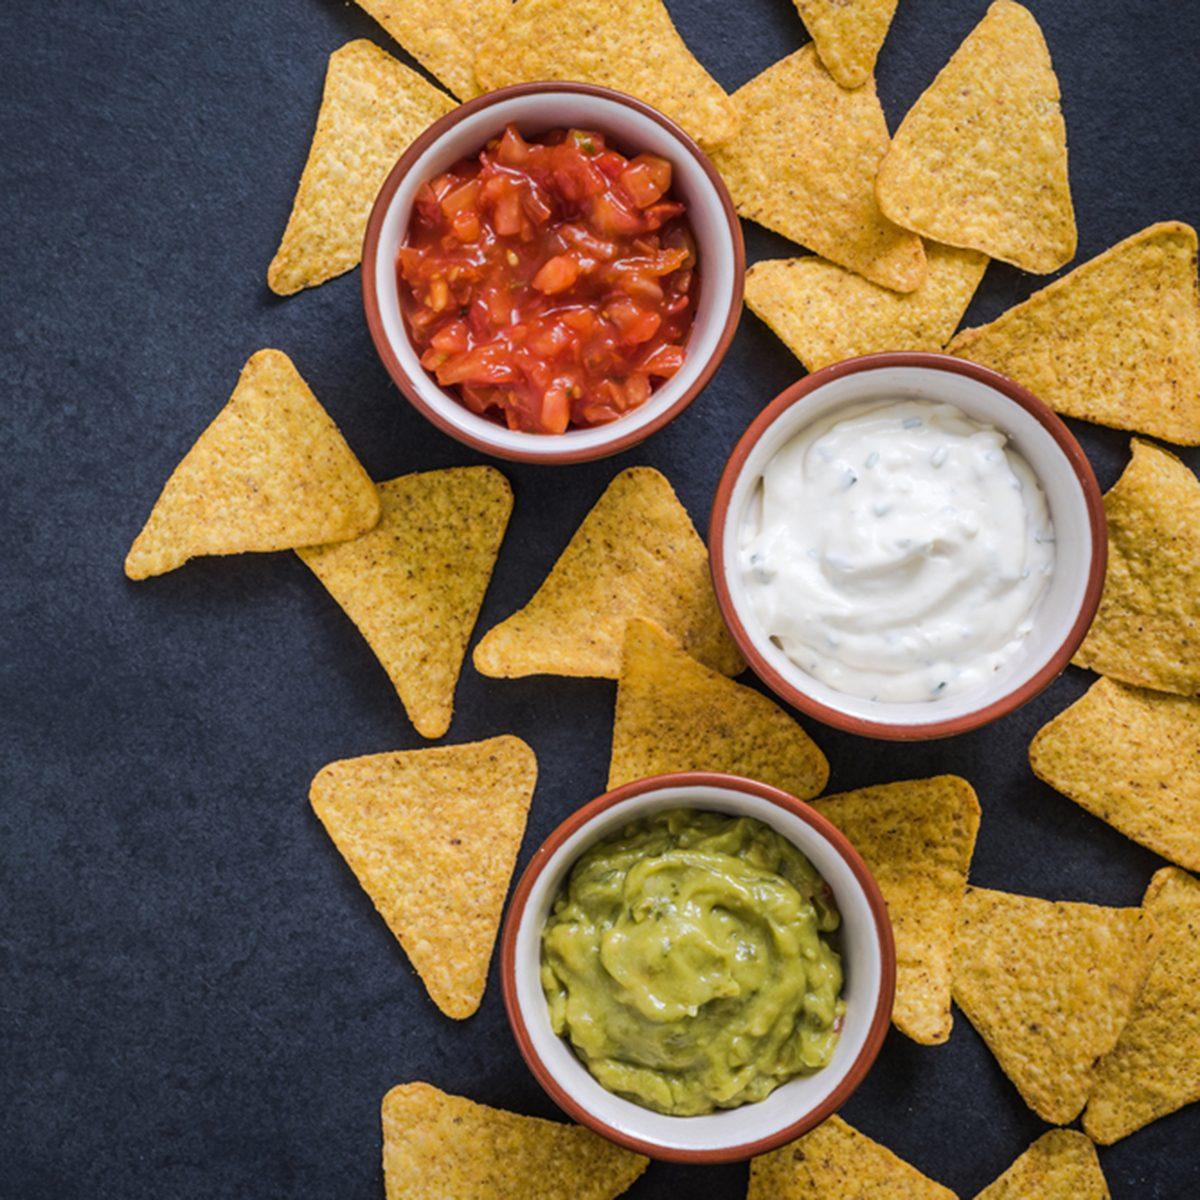 nachos with dips border background on dark slate